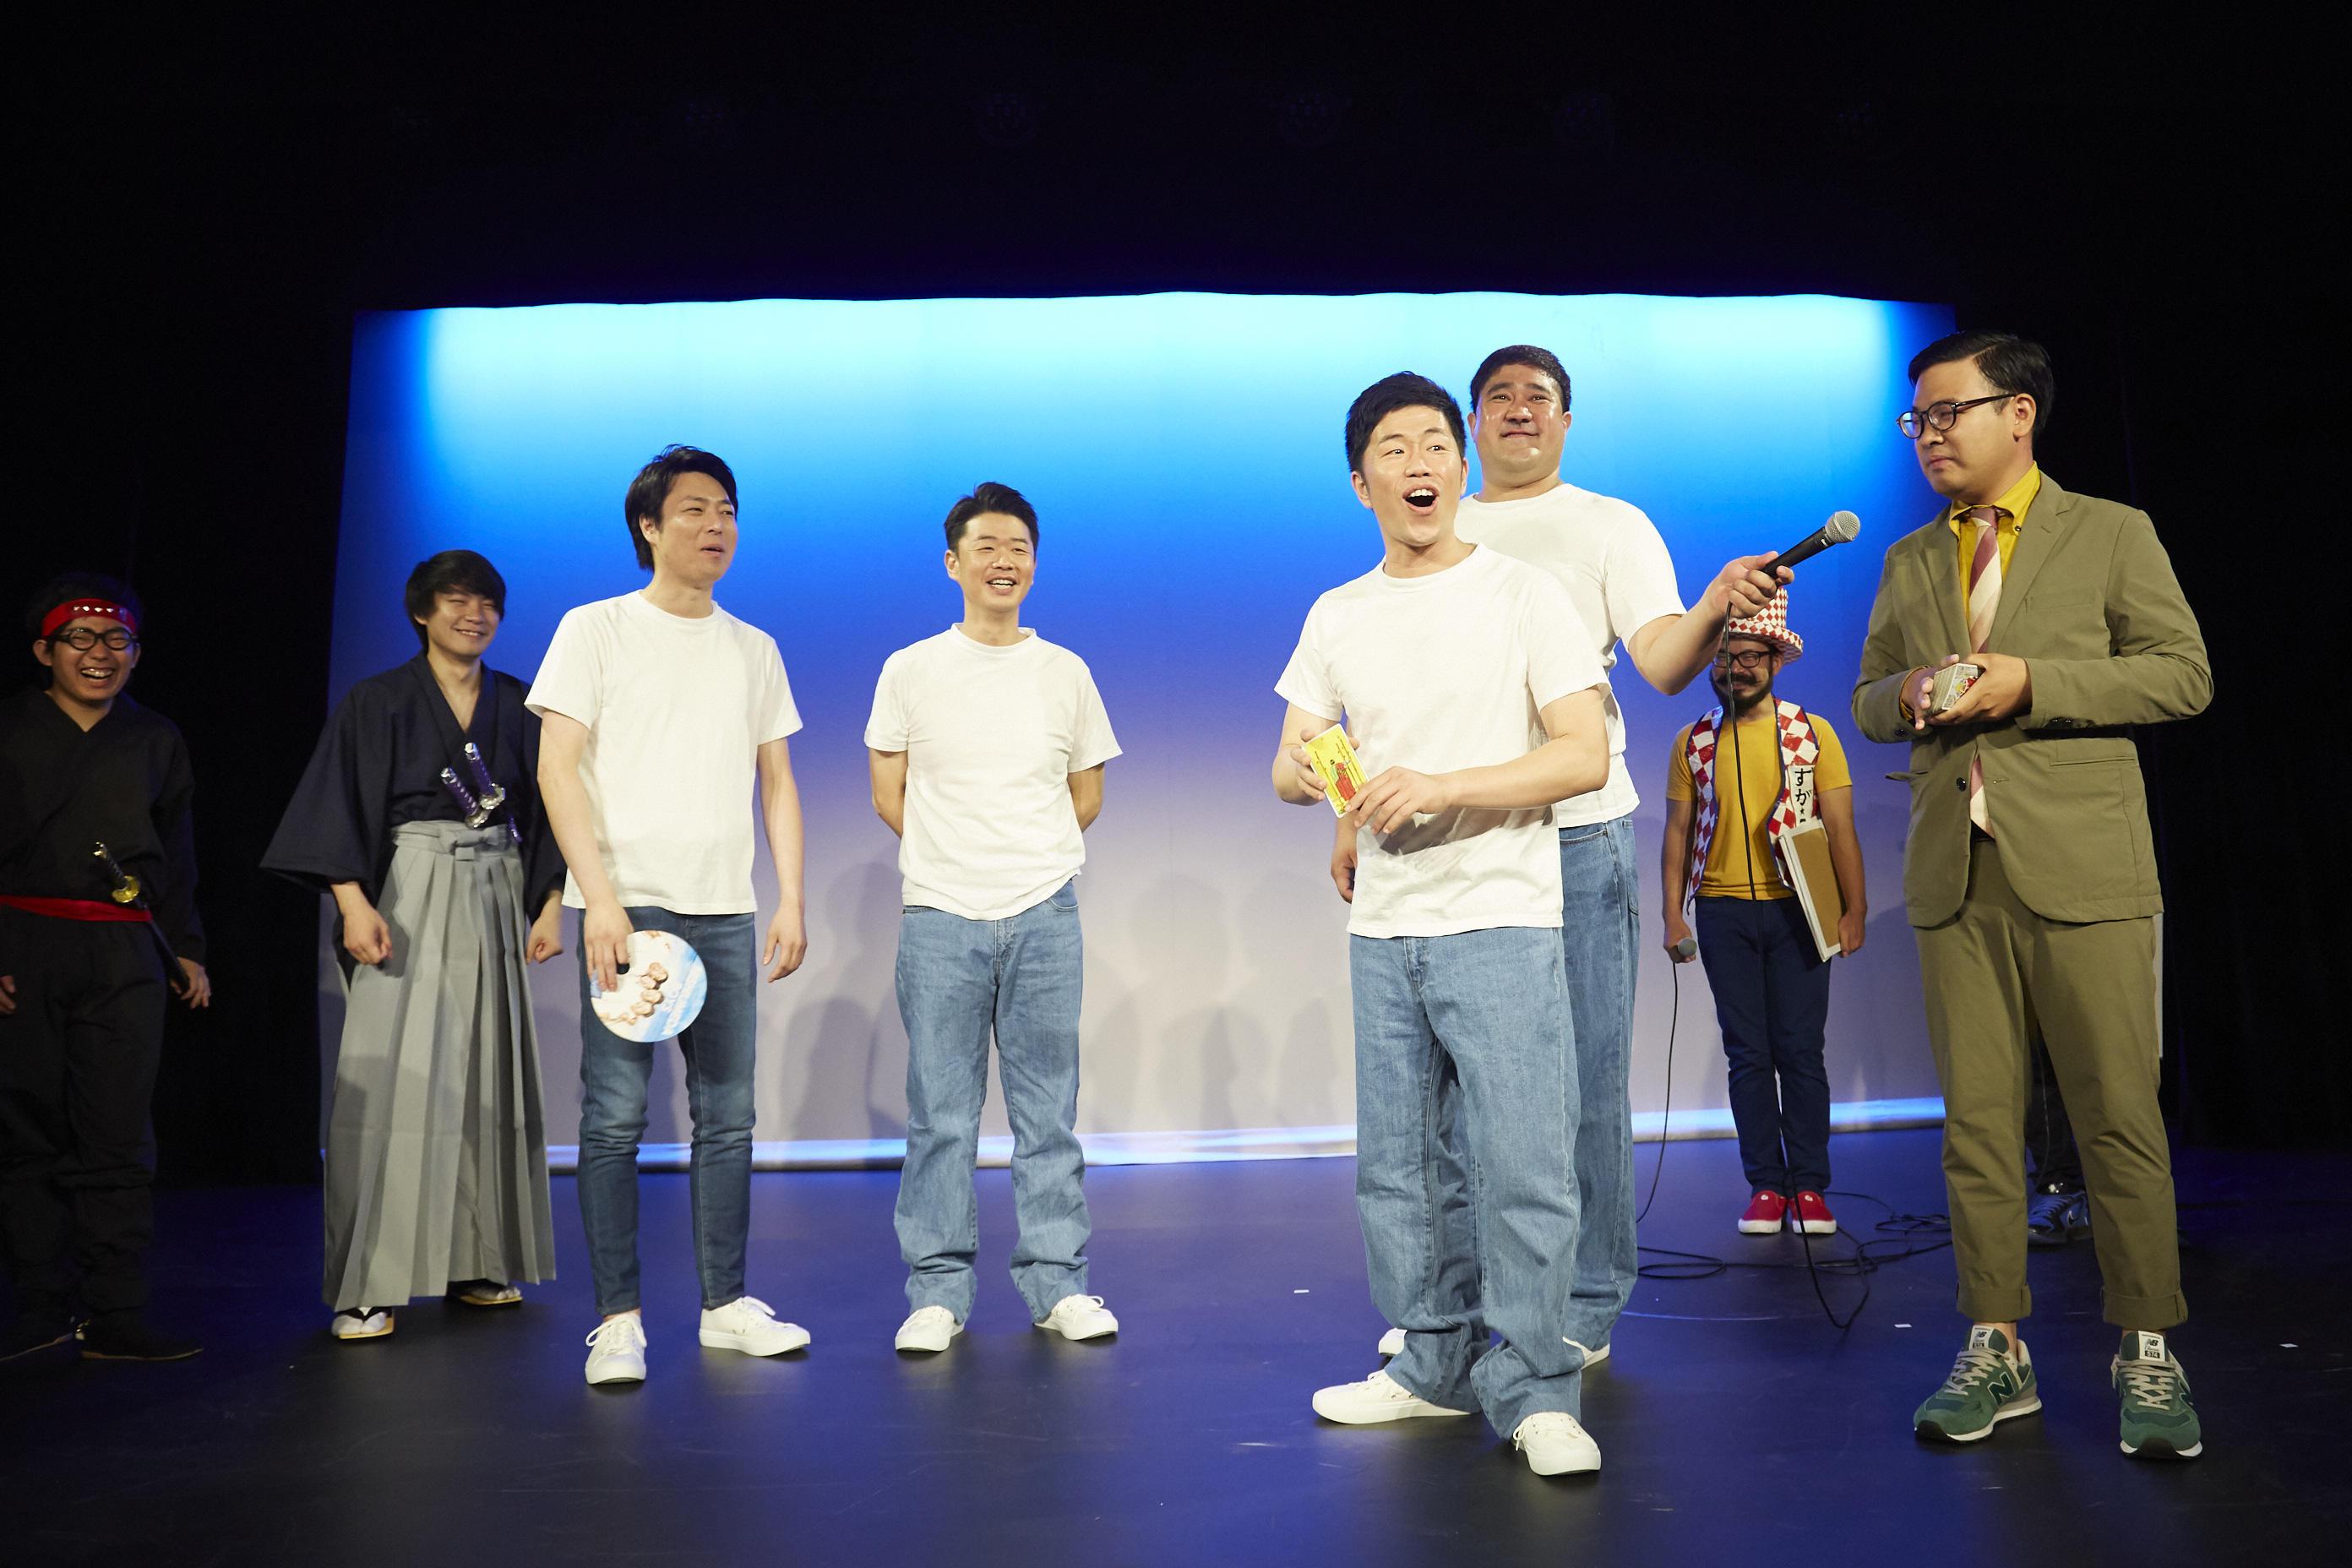 http://news.yoshimoto.co.jp/20180711201133-e2e9f690894de3d0d58c107e1c1bf0163b4f5c3b.jpg